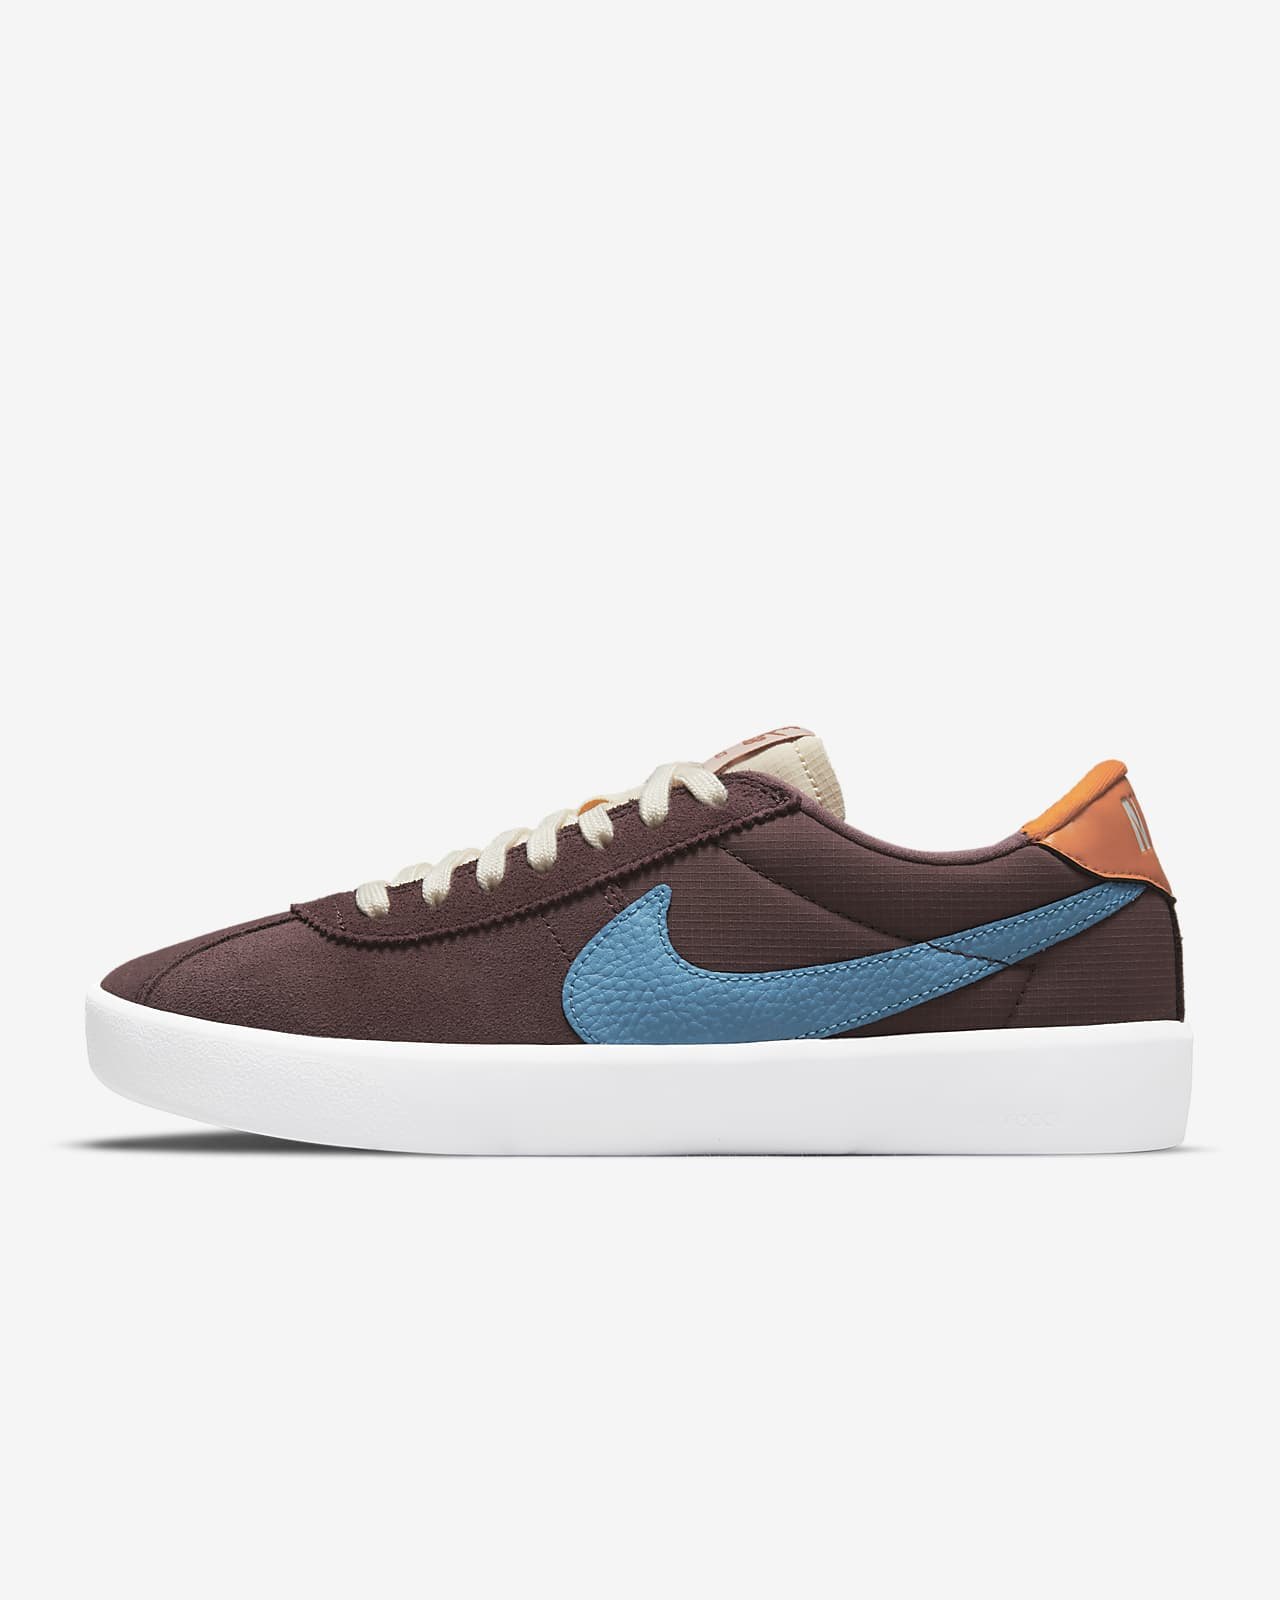 Nike SB Bruin React Skate Shoes